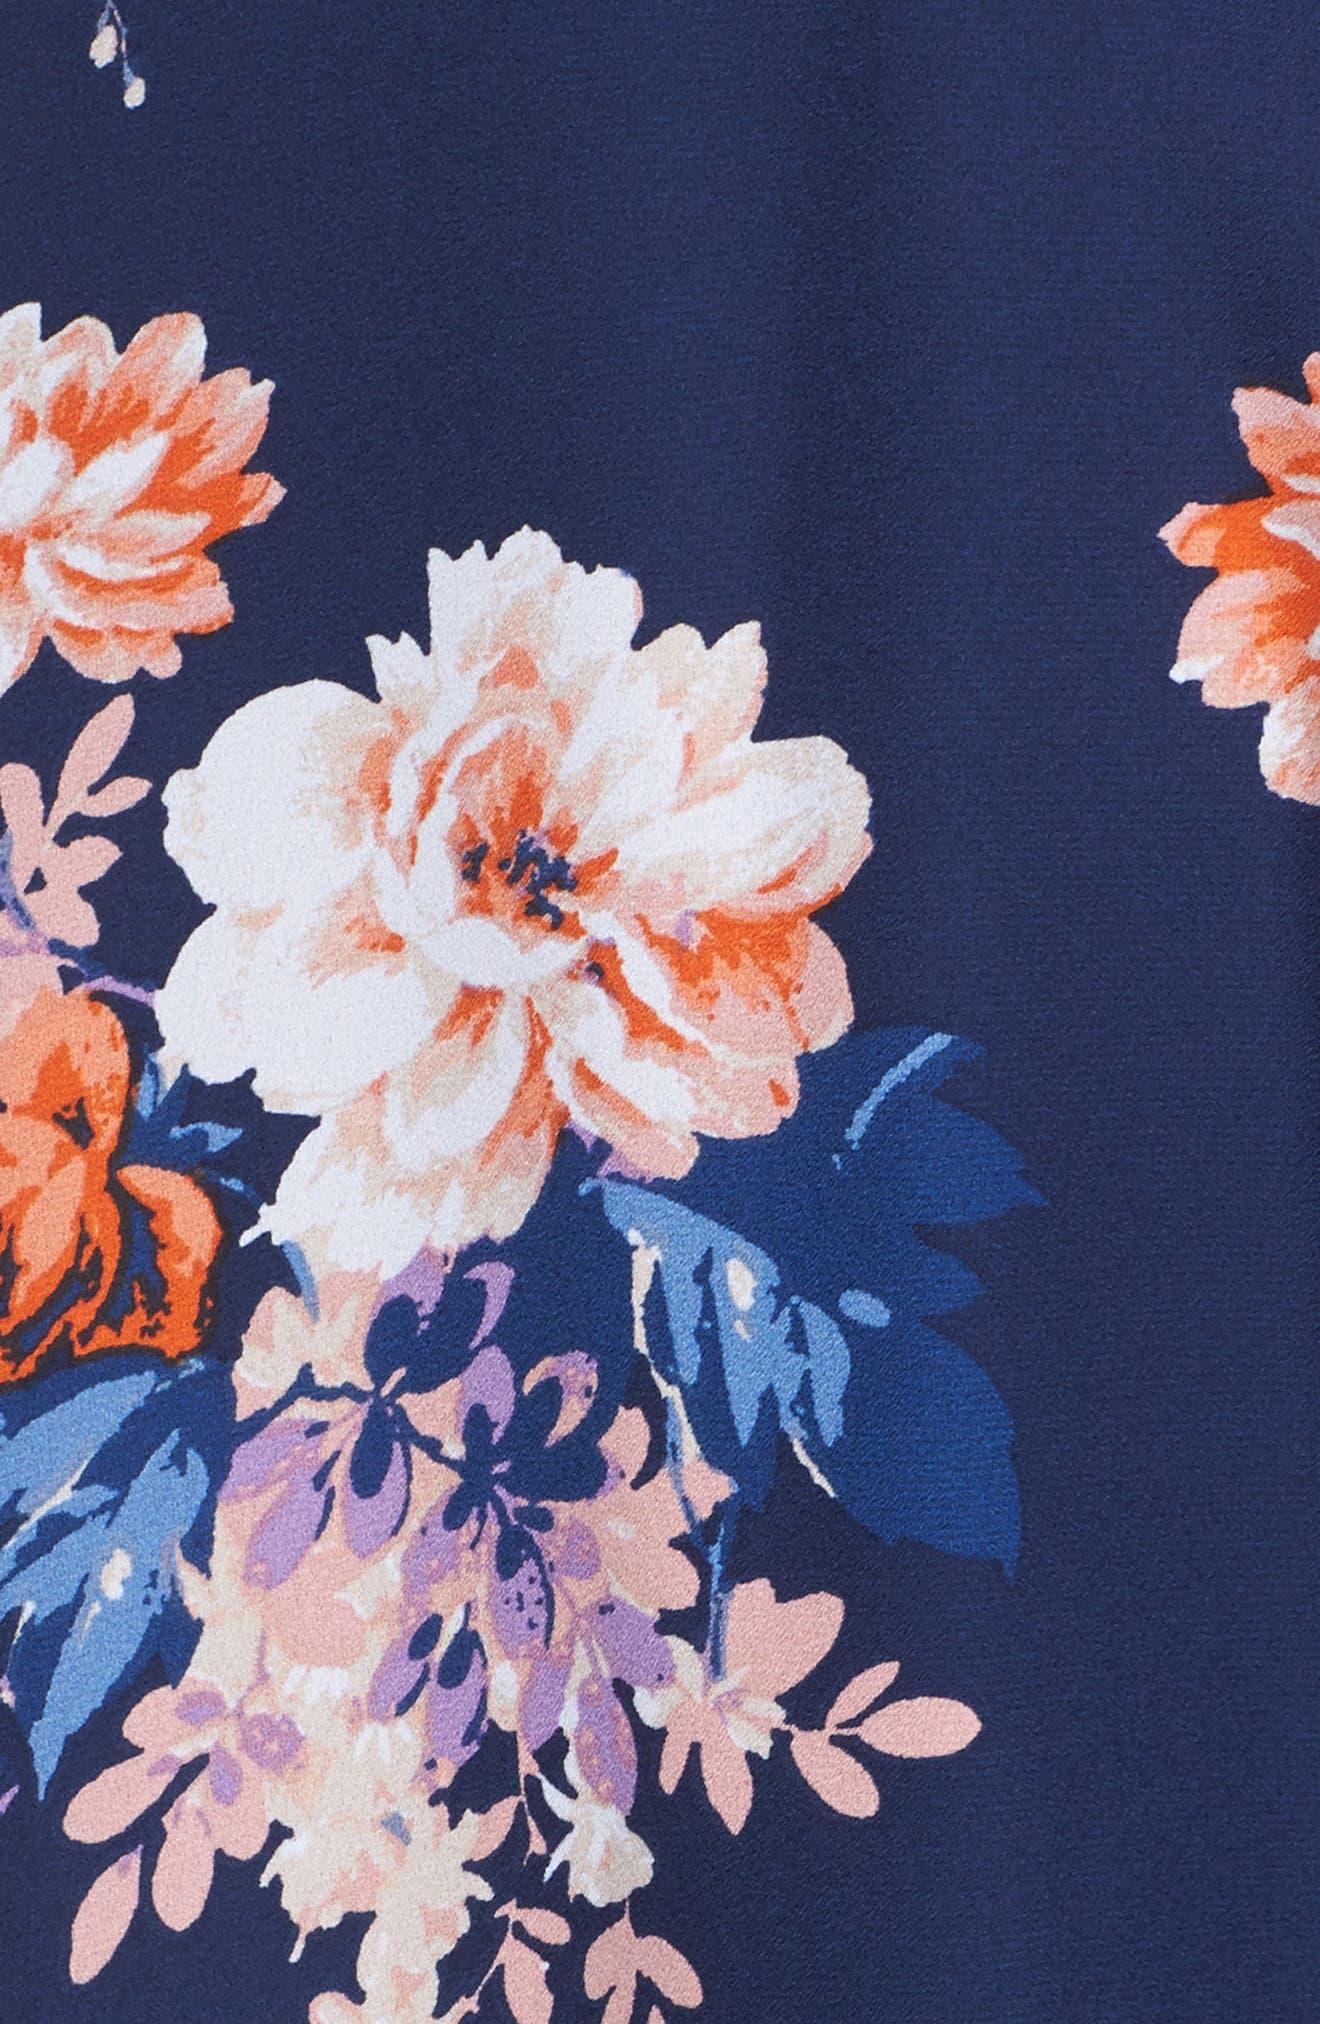 Chasing Butterflies Cold Shoulder Fit & Flare Dress,                             Alternate thumbnail 5, color,                             400